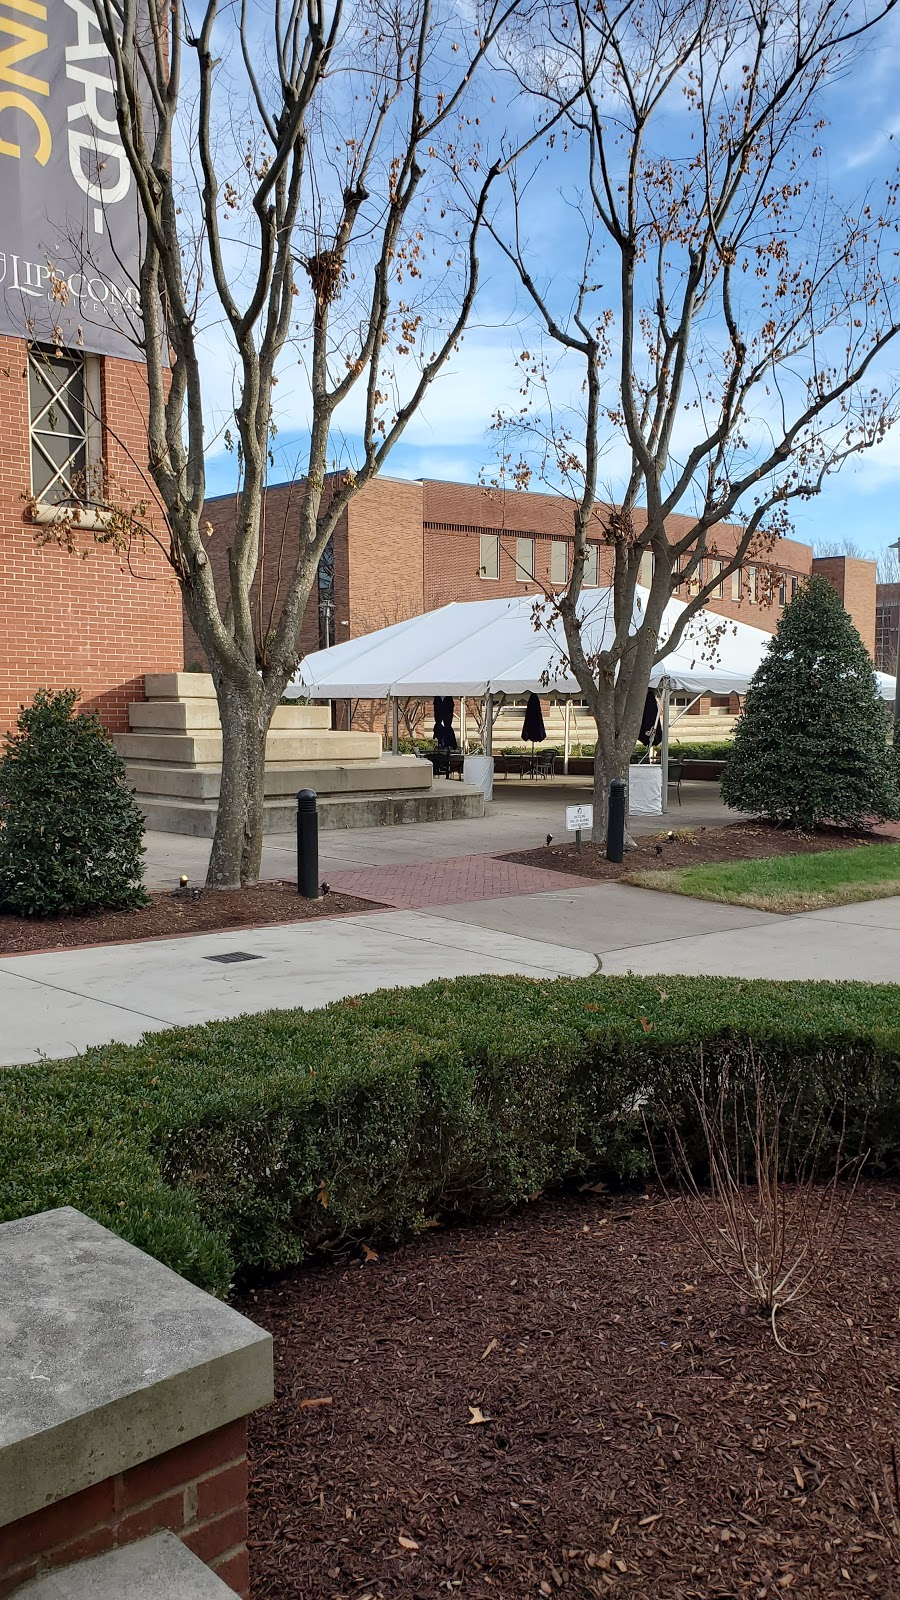 Student Activites Center - university  | Photo 2 of 3 | Address: 4015 Granny White Pike, Nashville, TN 37204, USA | Phone: (615) 966-1000